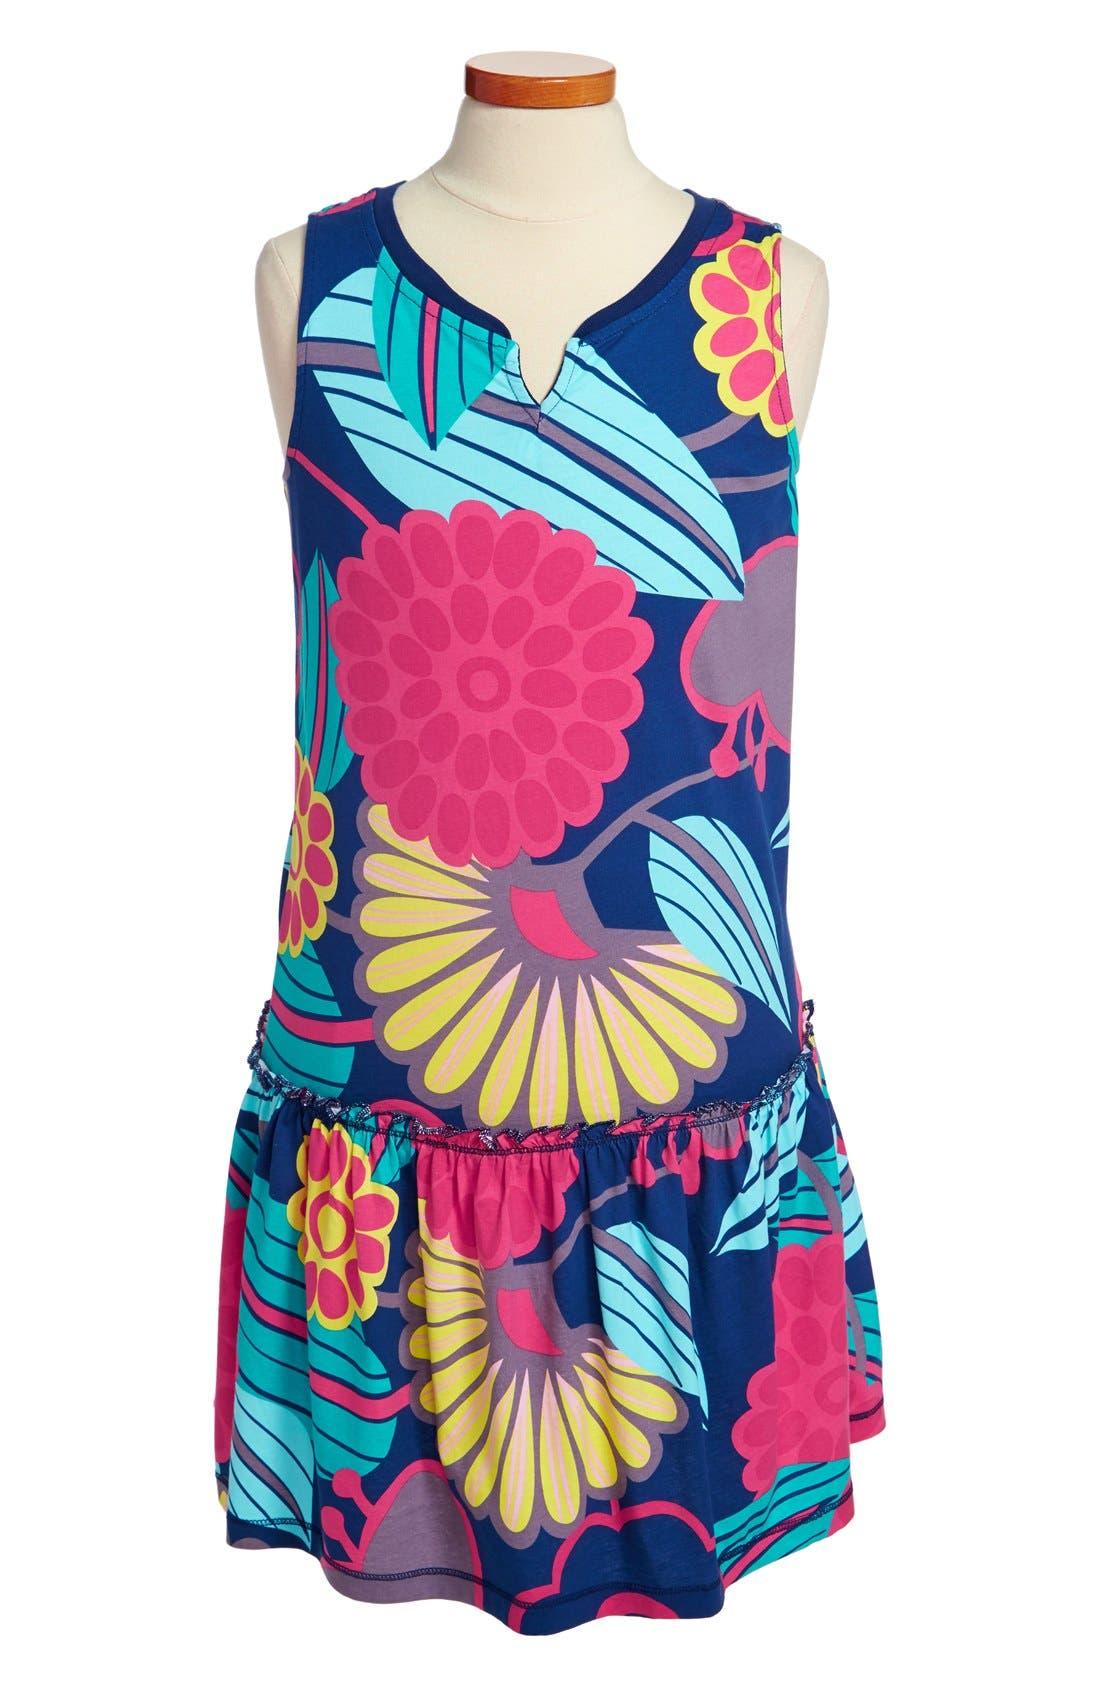 Alternate Image 1 Selected - Tea Collection 'Mod Gypsy' Print Dress (Toddler Girls, Little Girls & Big Girls)